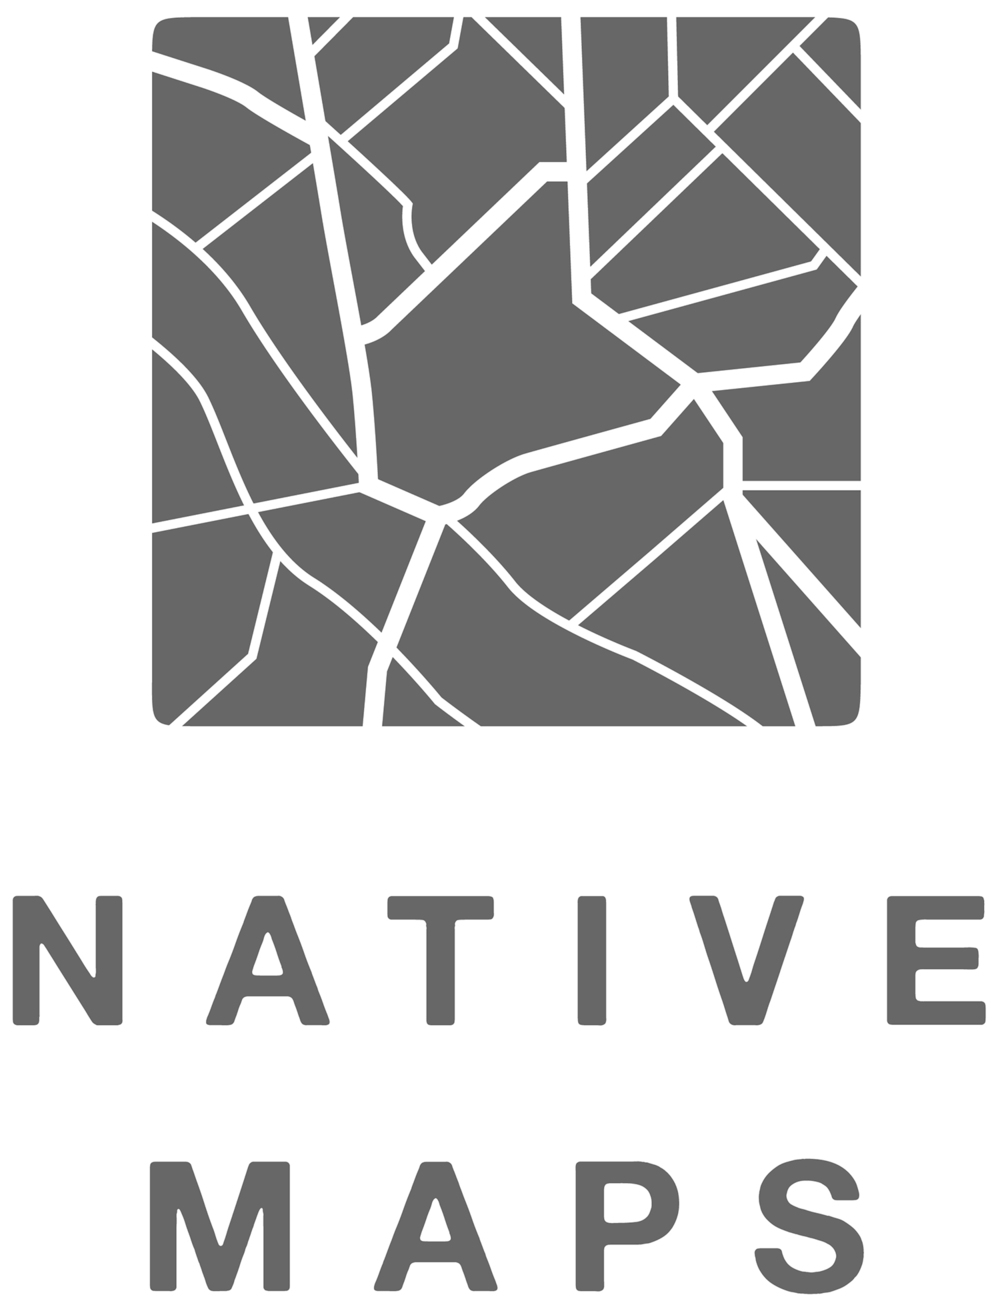 Native_Maps_logo.jpg